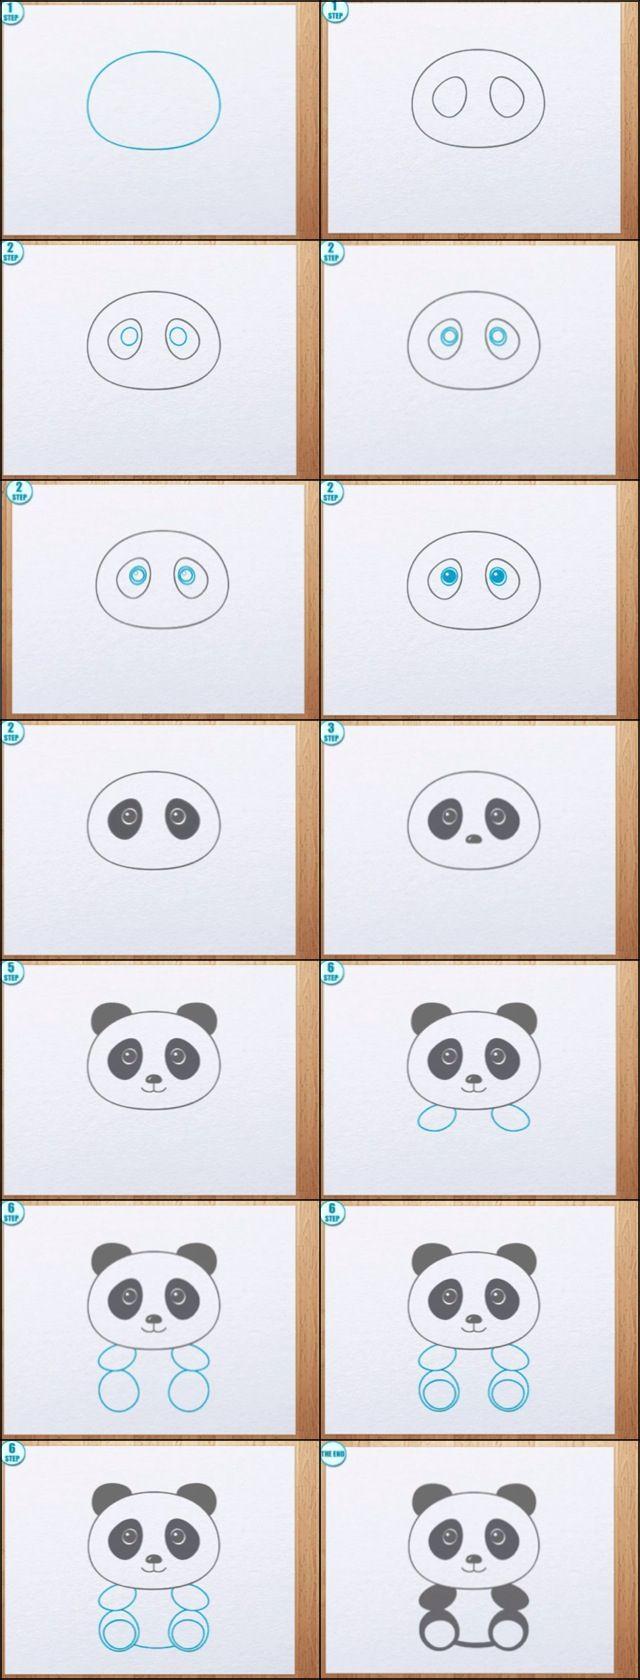 Comment Dessiner Un Panda Astuce Enfant Dessins Faciles